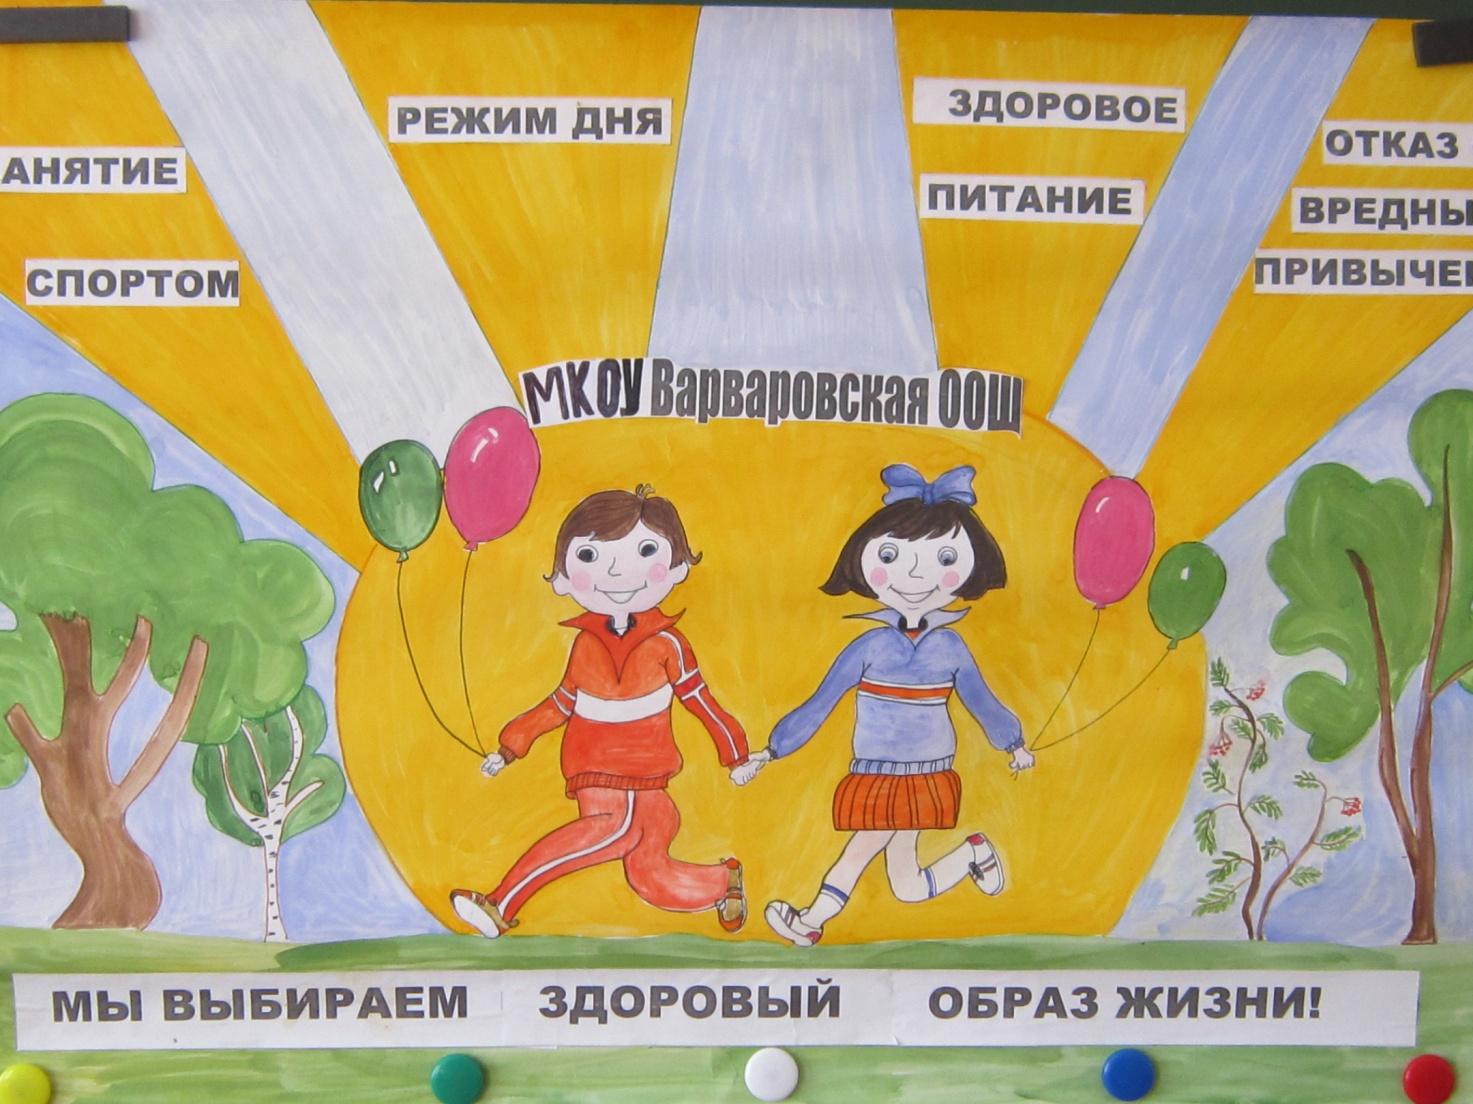 C:\Documents and Settings\Варваровка\Рабочий стол\IMG_3351.JPG